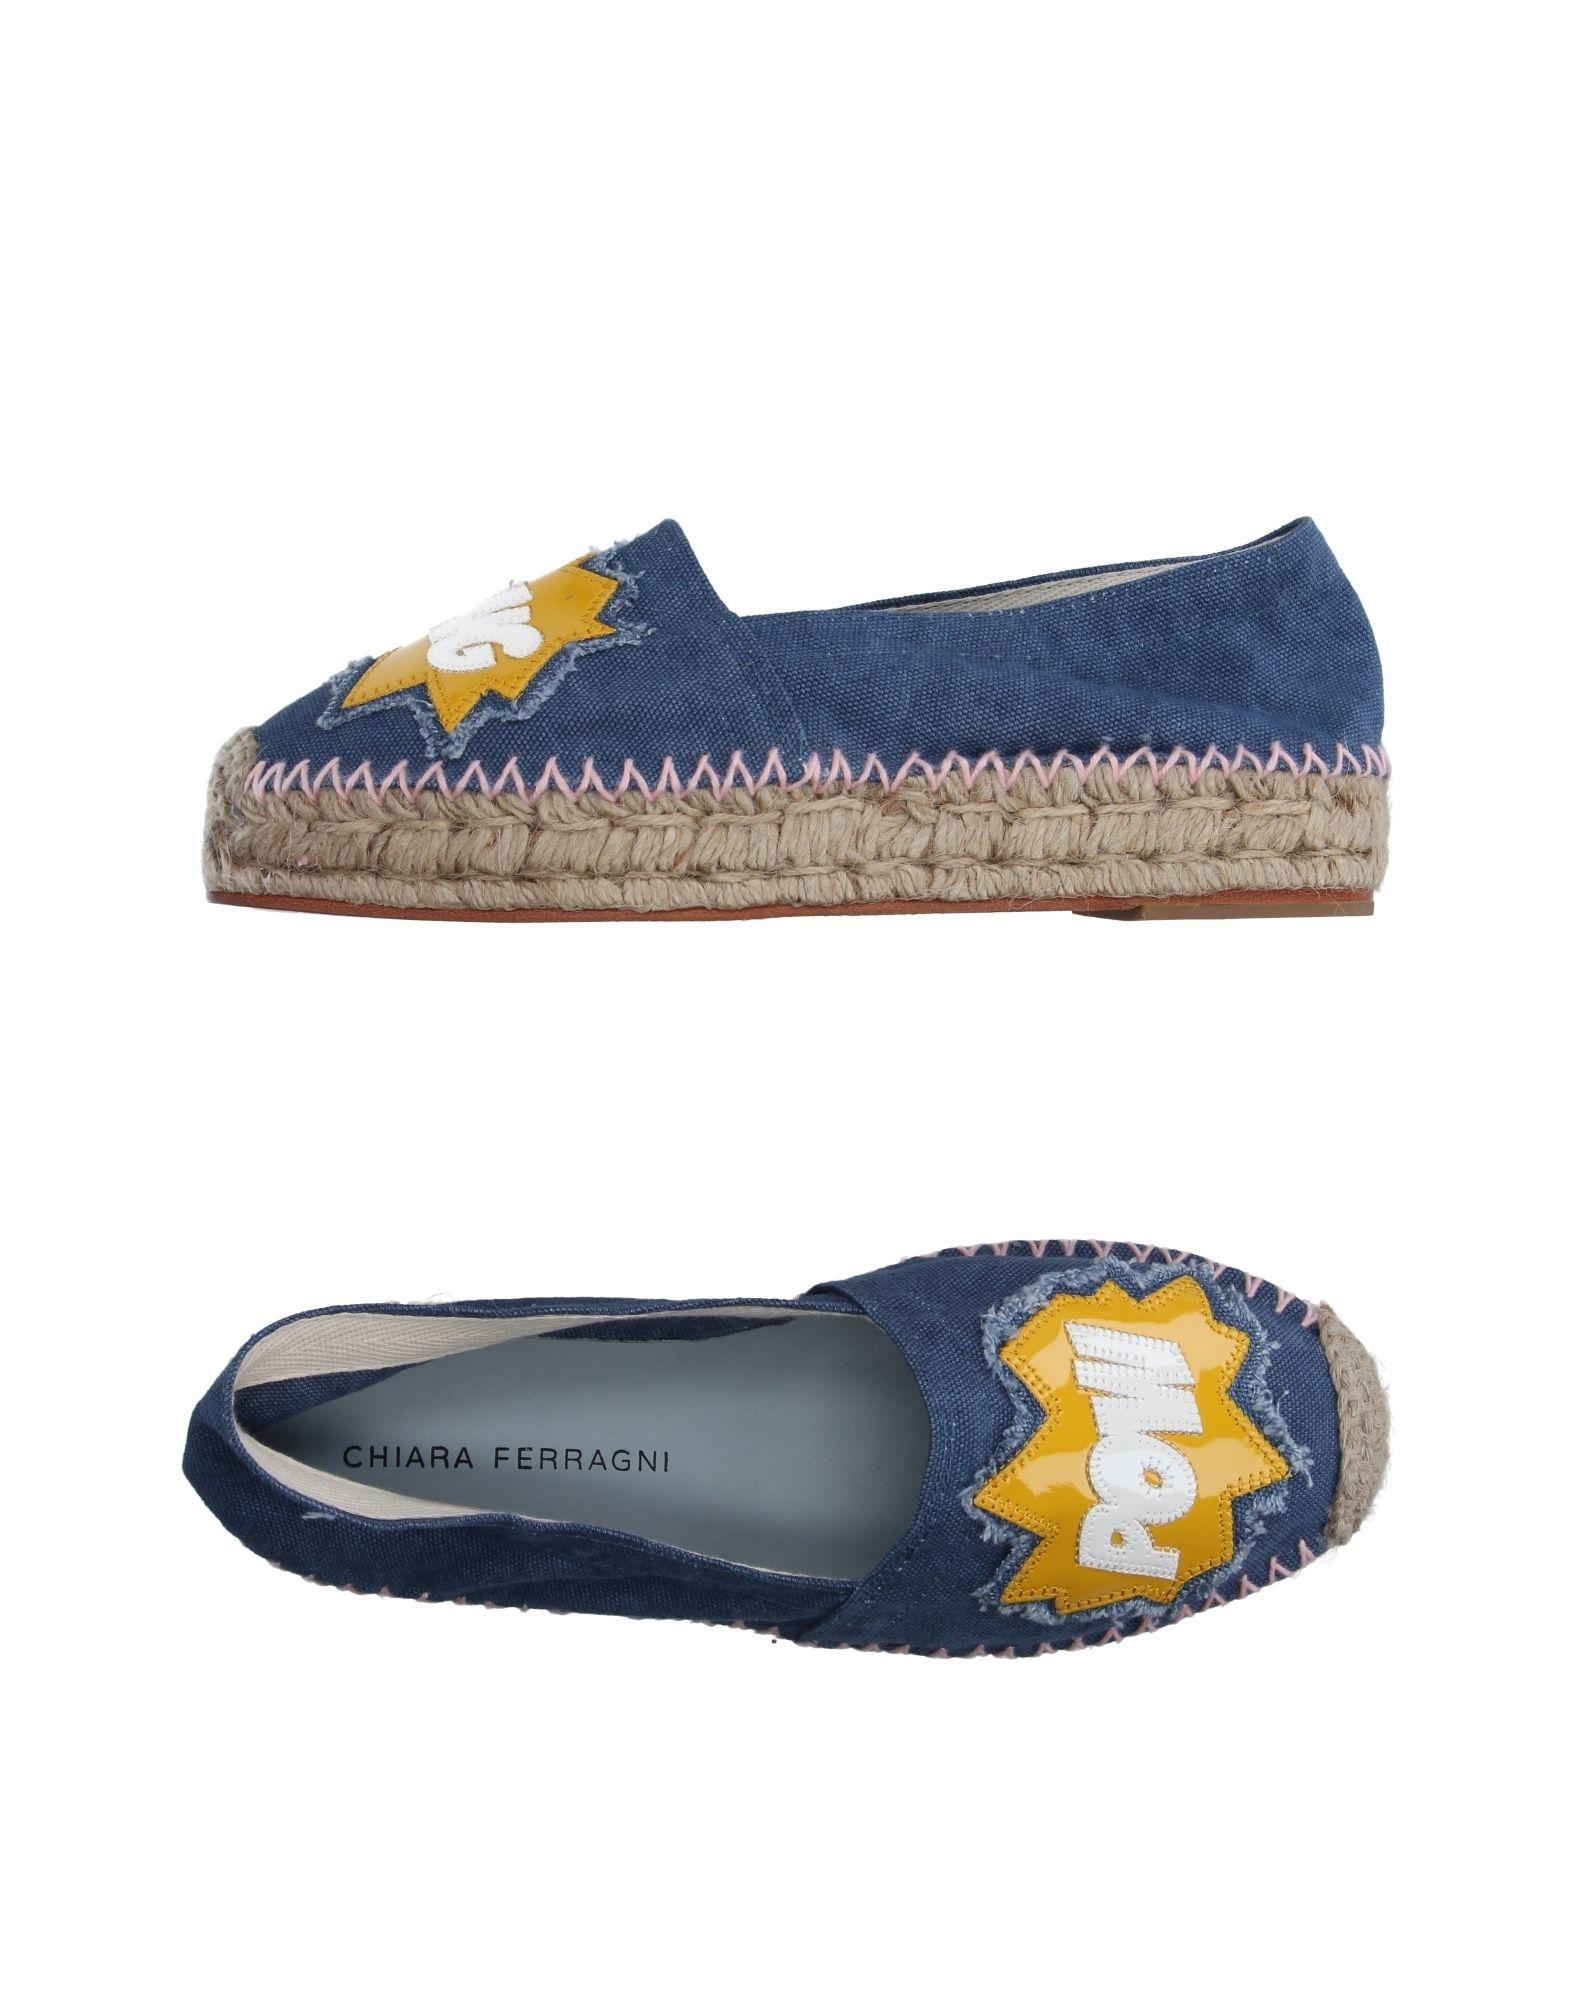 Stilvolle billige Schuhe Chiara Ferragni Espadrilles Damen  11132419LP